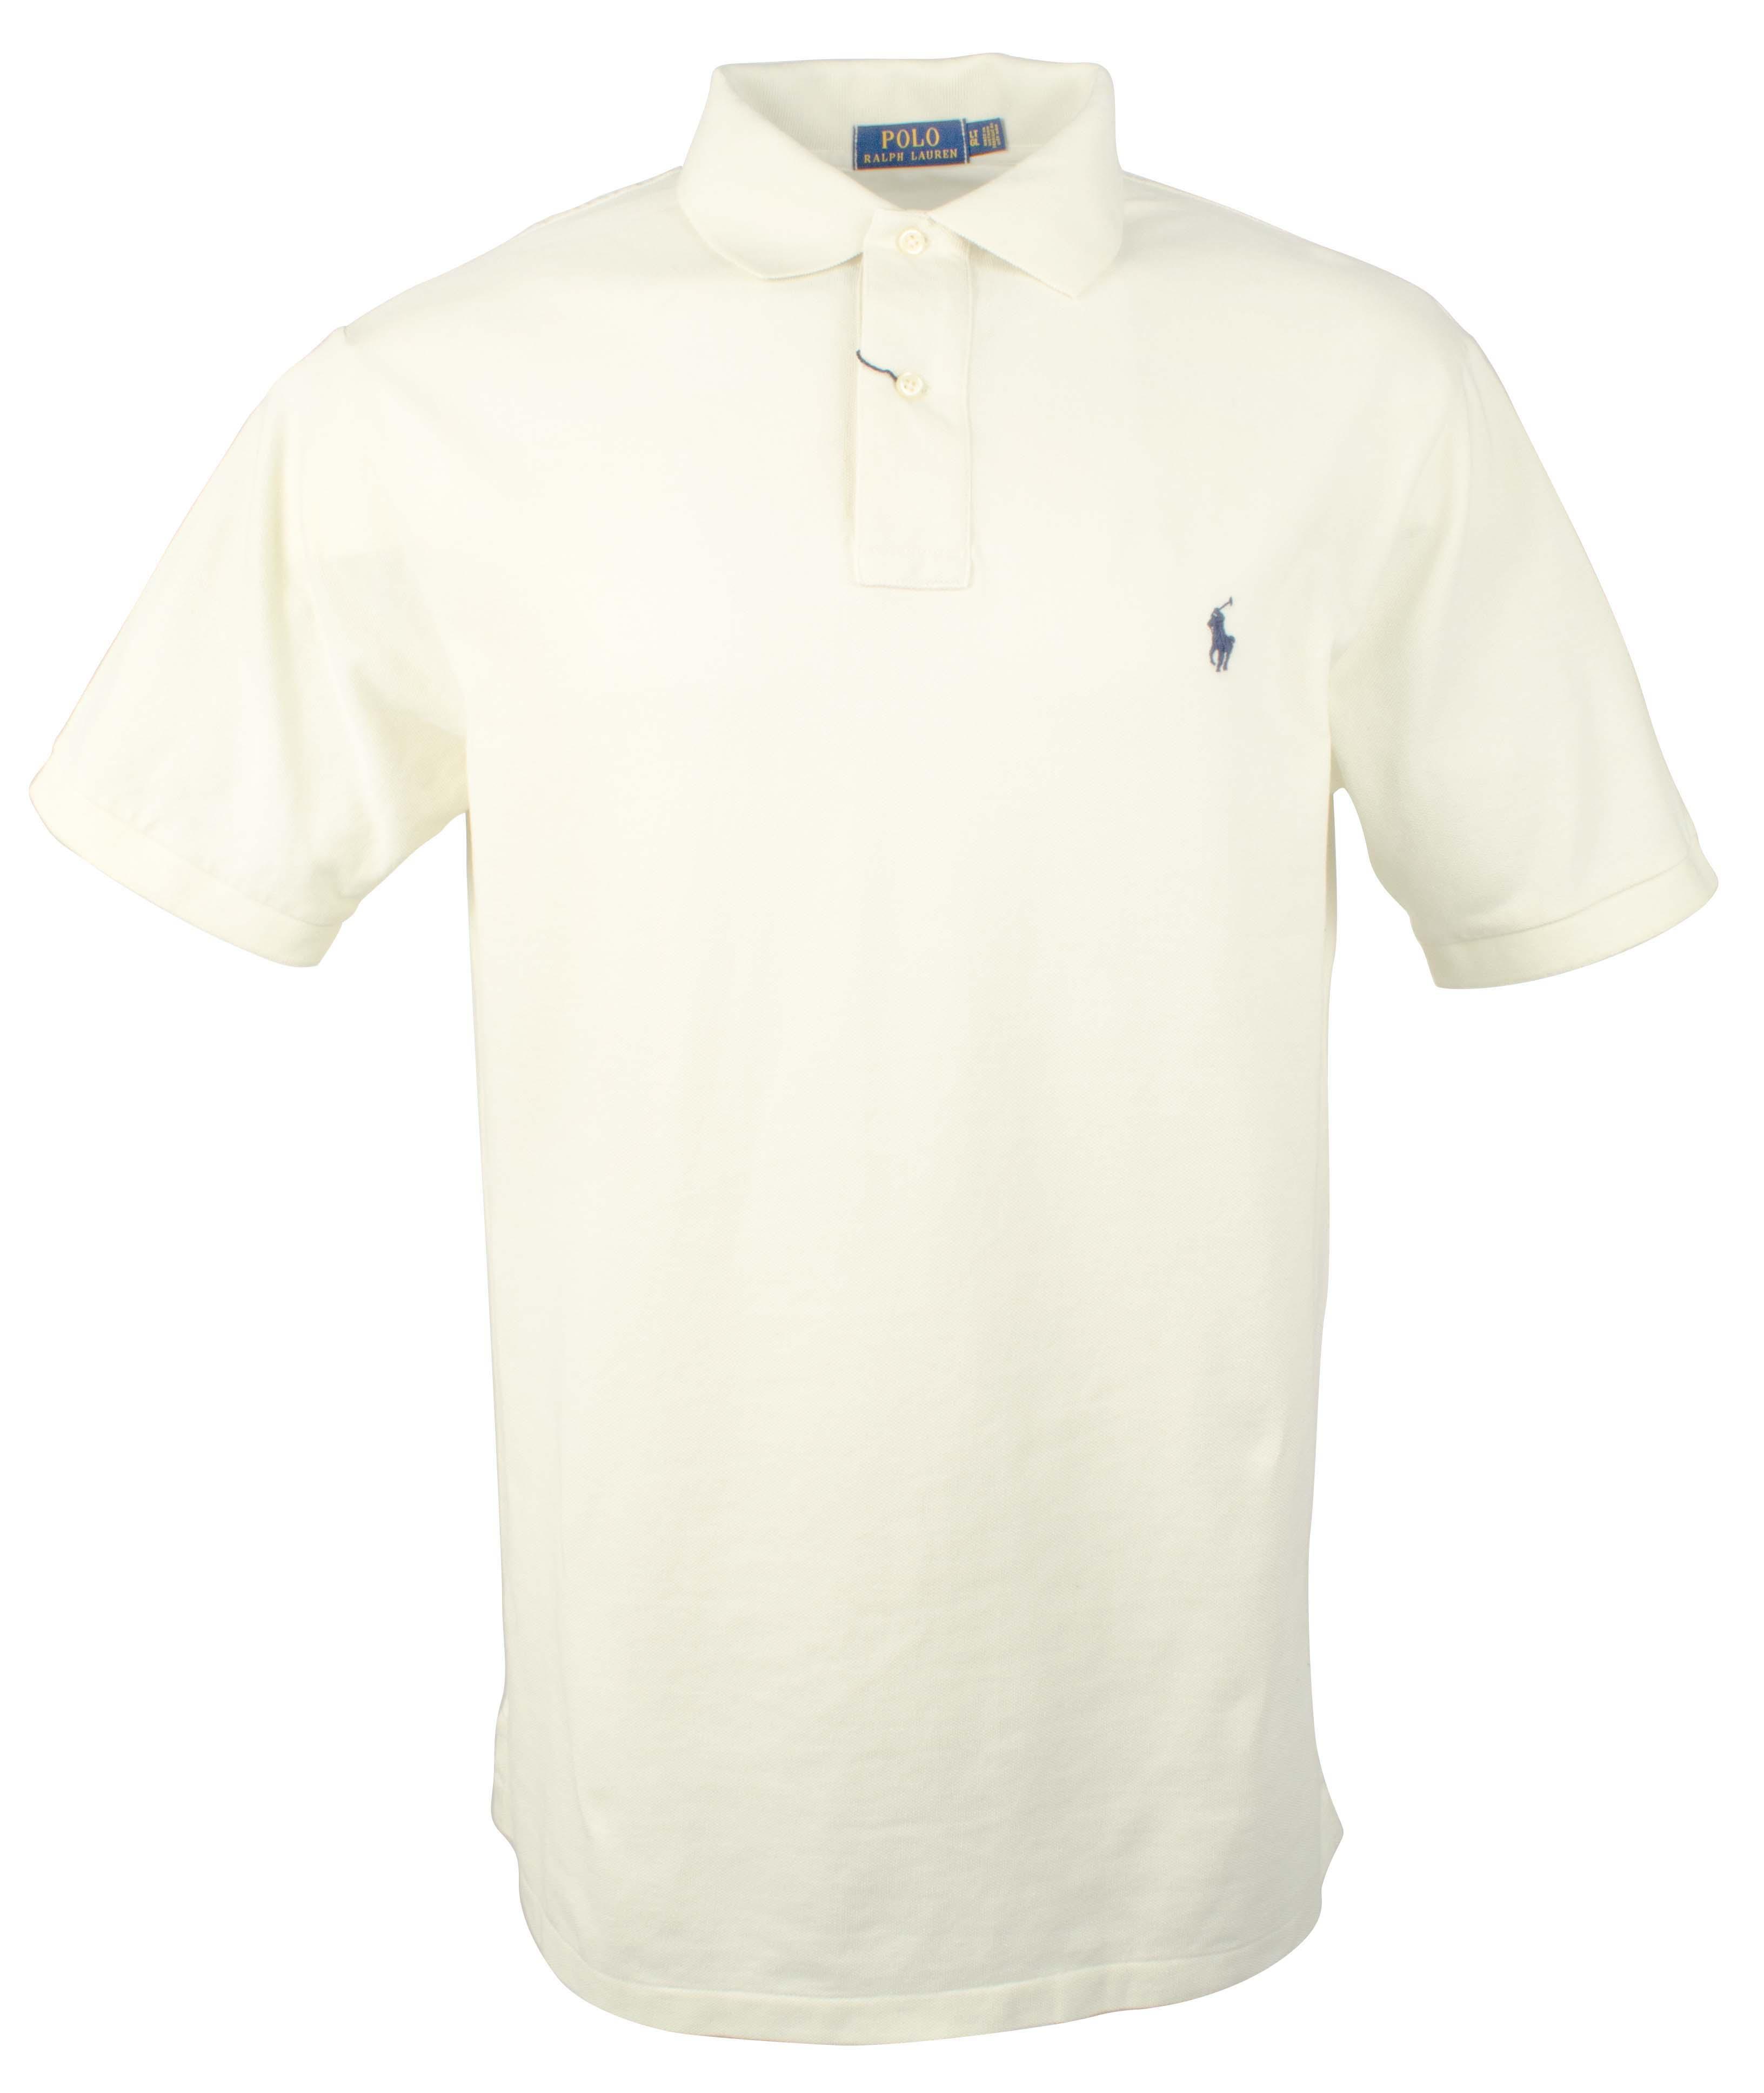 63559019f3316d Polo Ralph Lauren Men's Big & Tall Classic Fit Mesh Polo Shirt | eBay